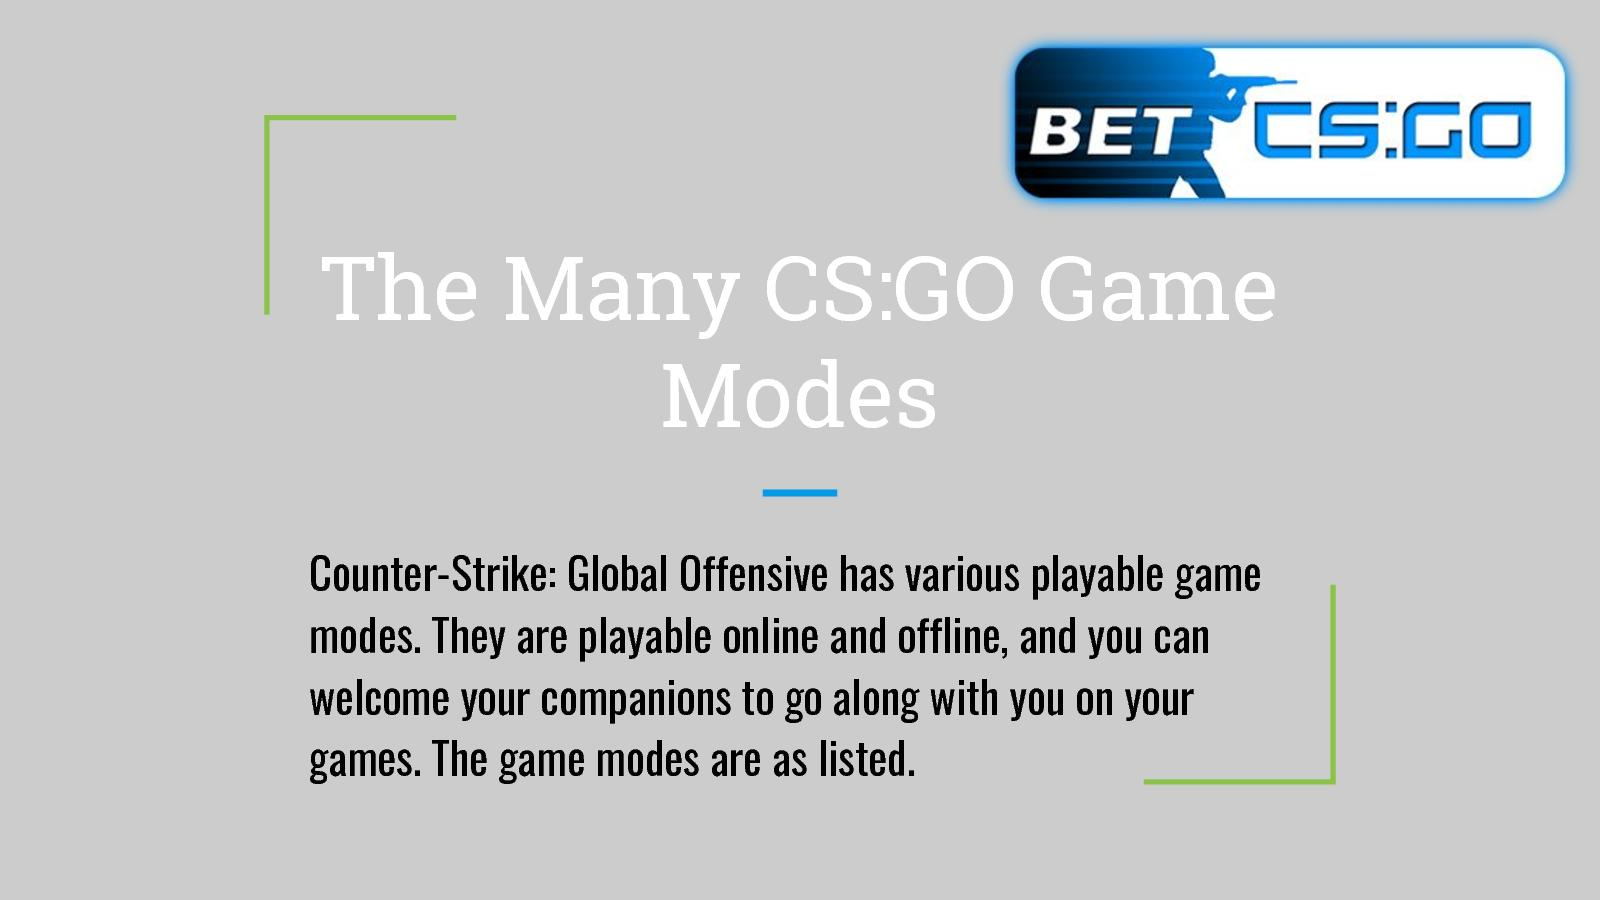 Active duty vs reserve csgo betting chiefs vs colts betting predictions free